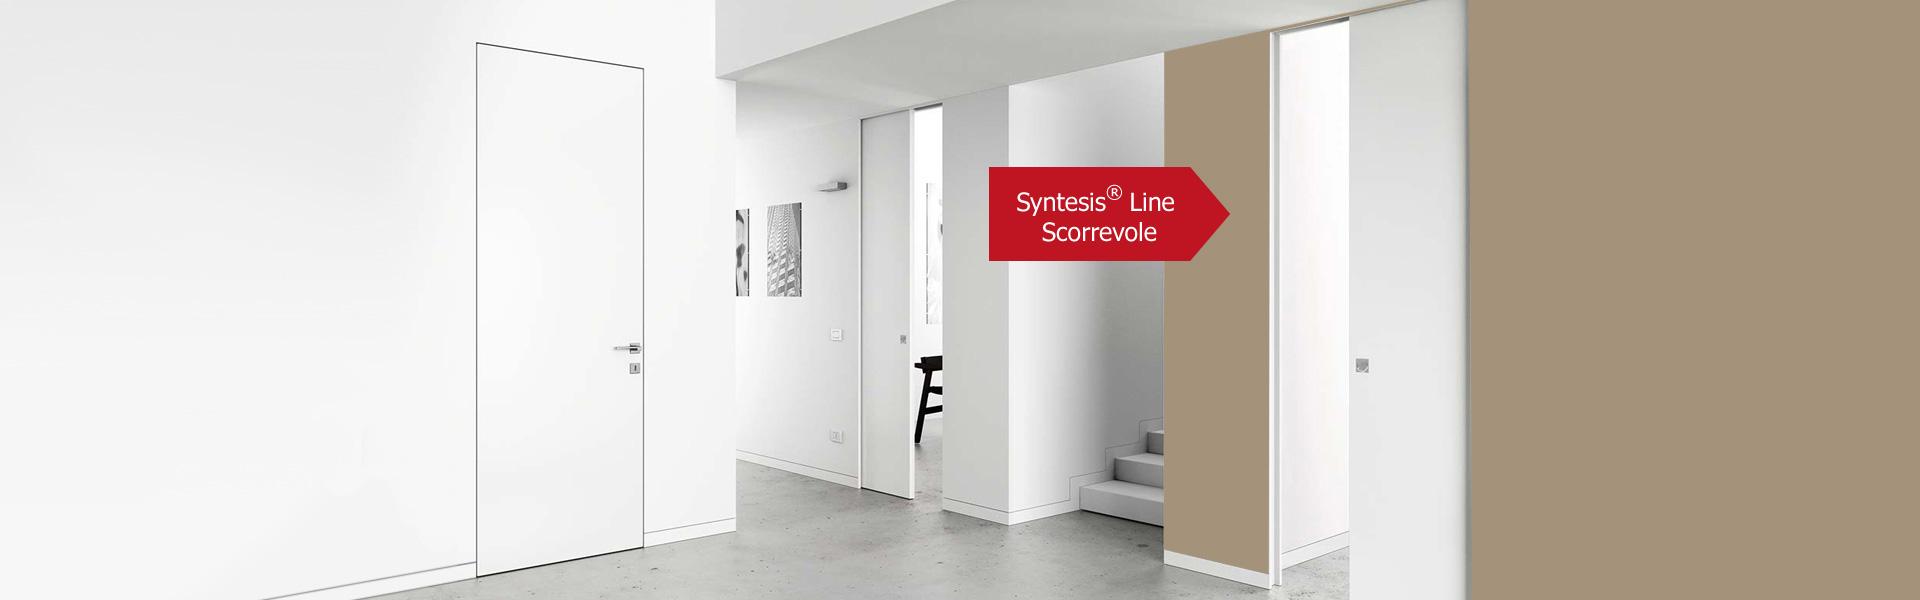 Syntesis Line Scorrevole